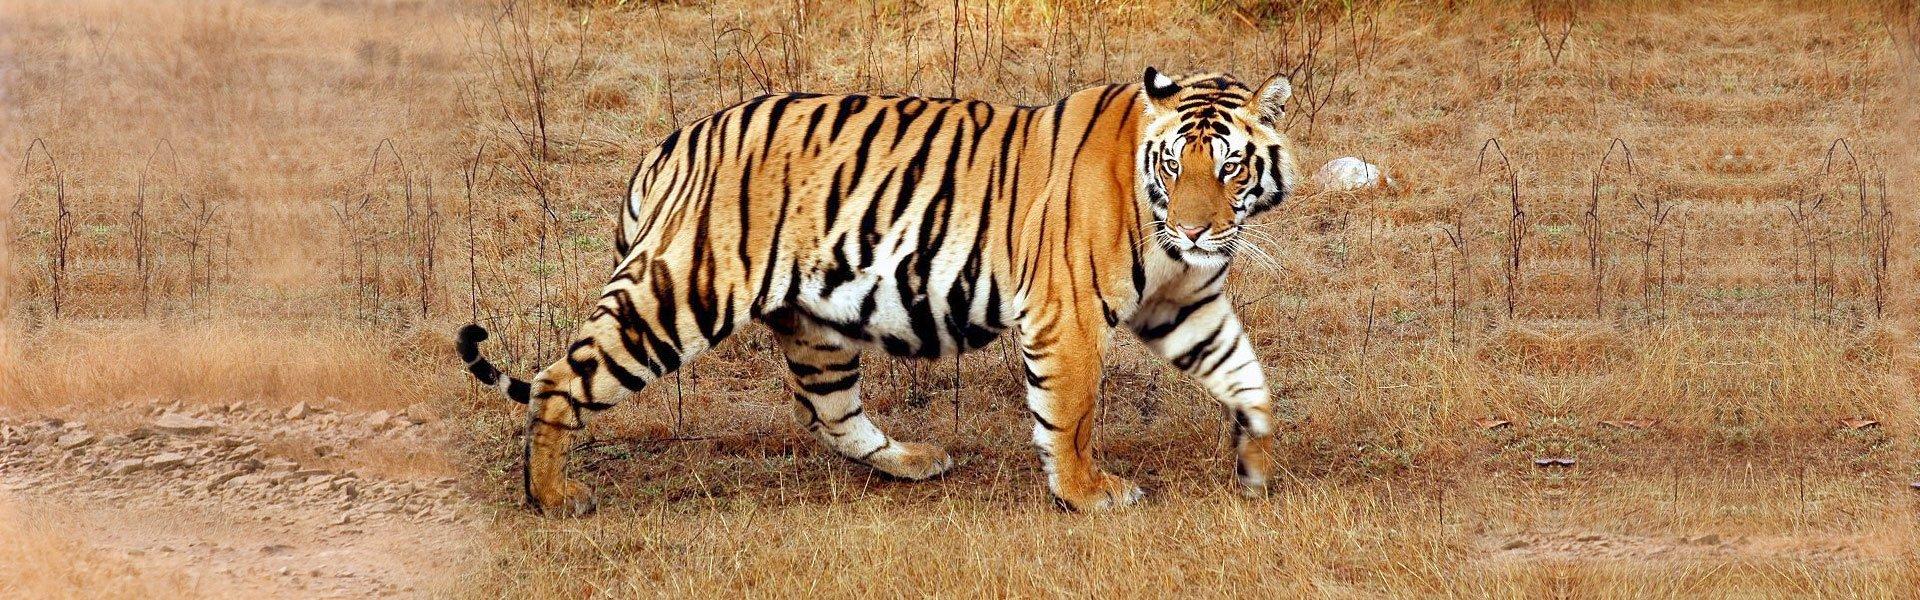 Taj Mahal and the tale of Tiger